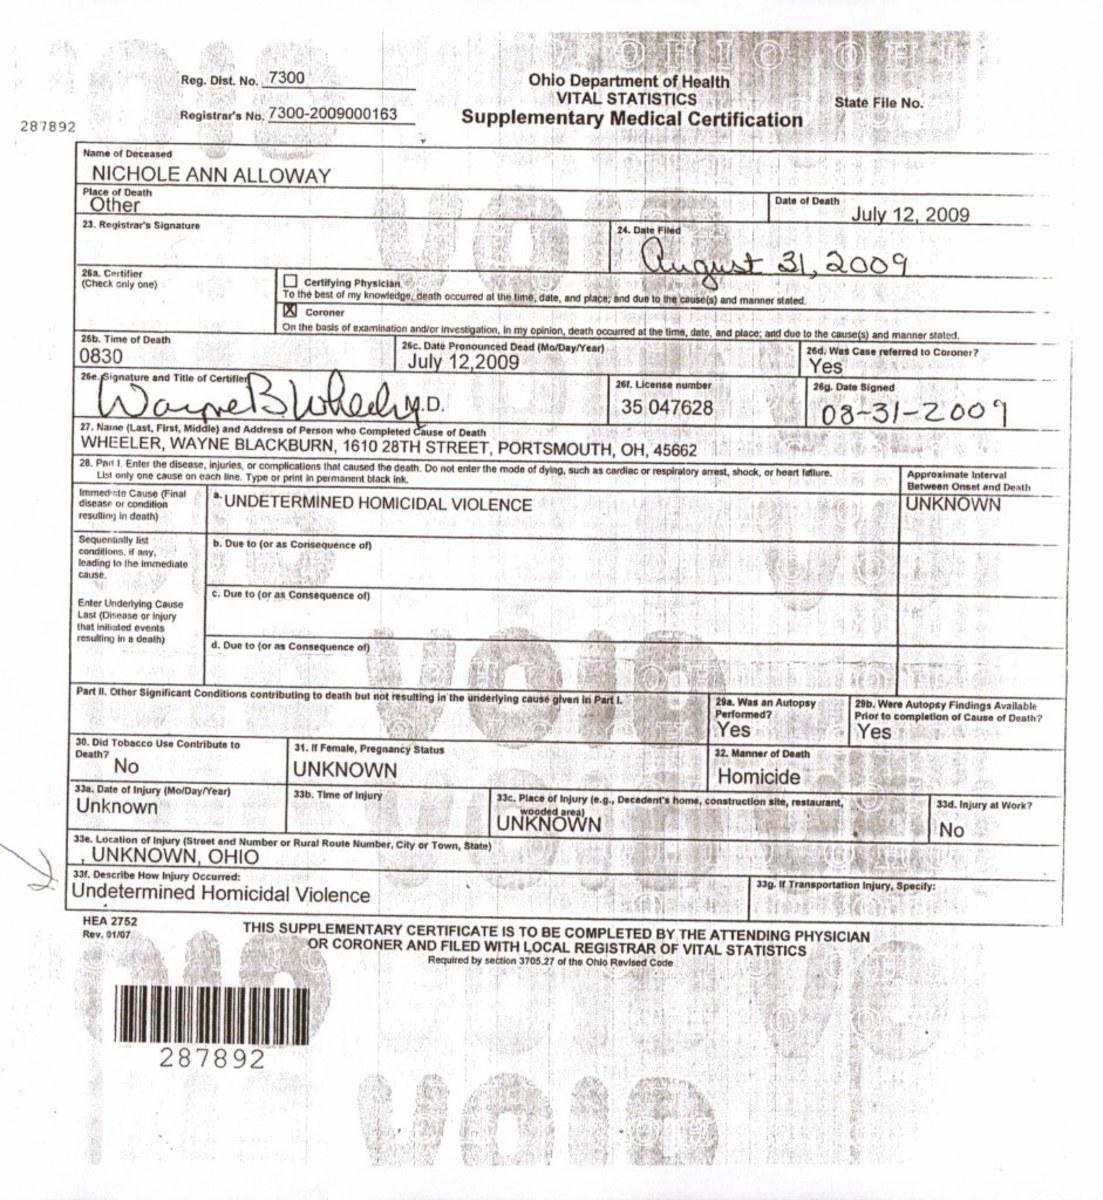 Final Death Certificate, Nichole Alloway